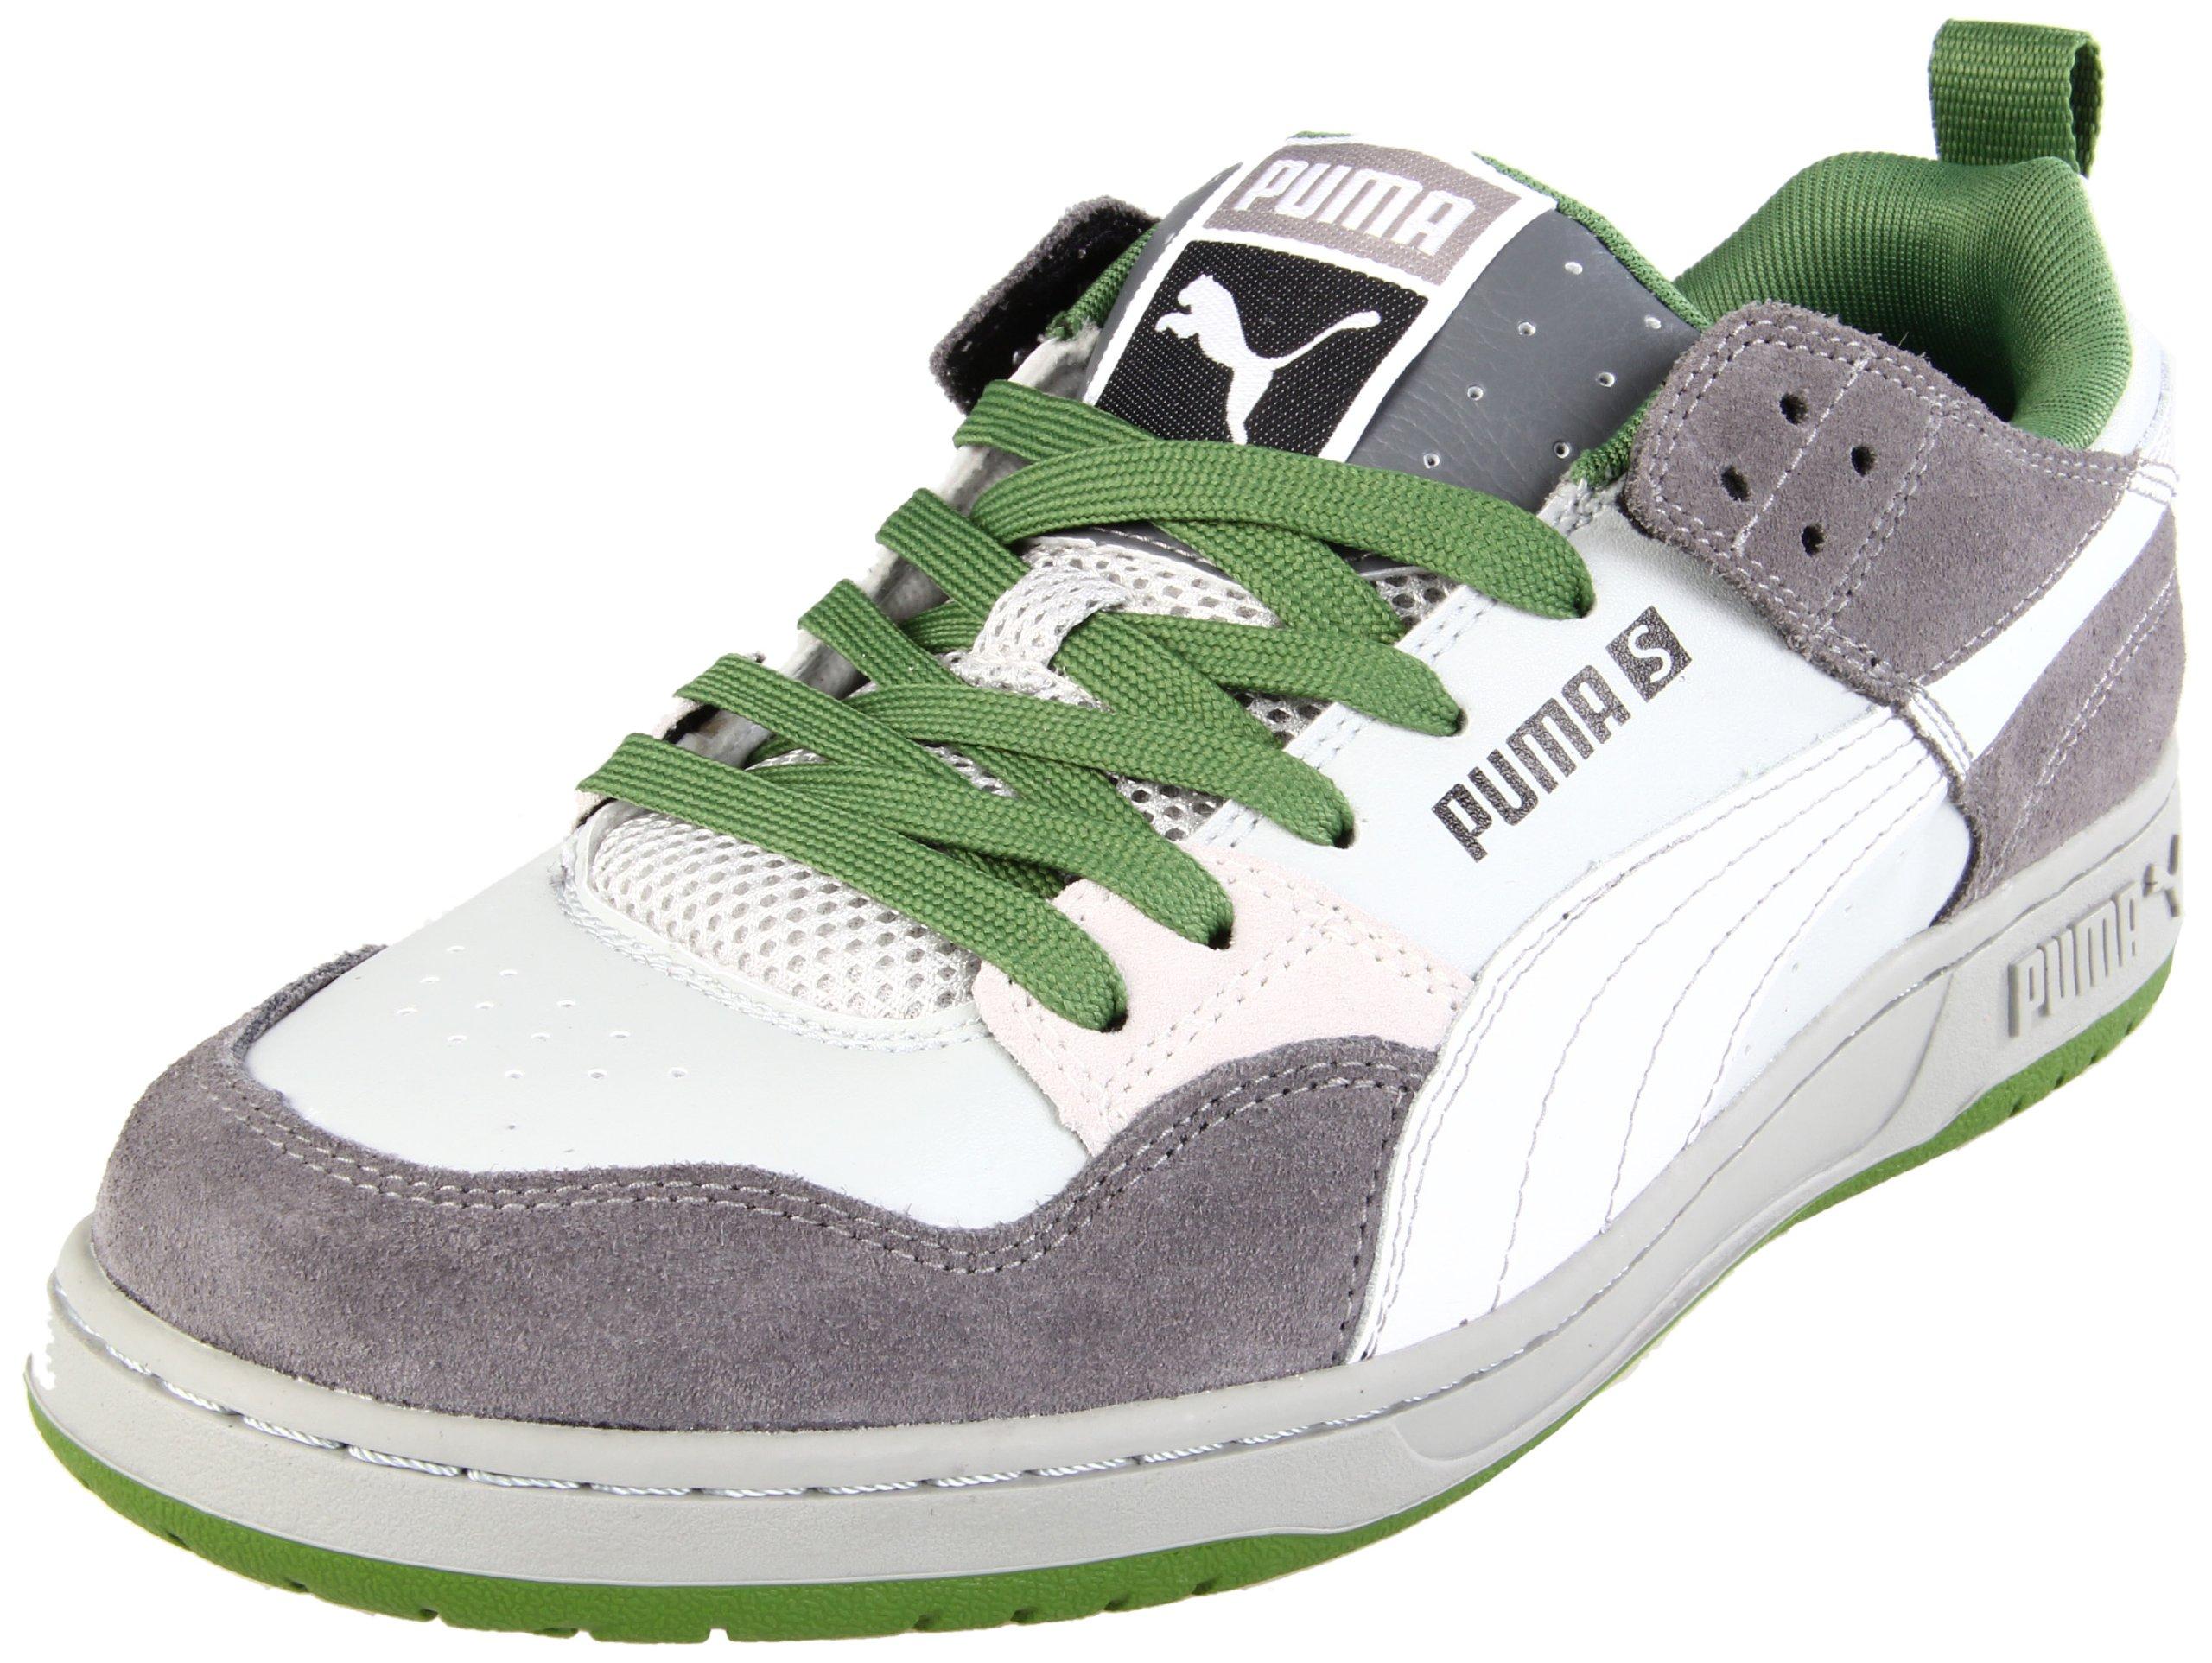 Puma Grifter S Fashion Sneaker,Grey Violet/White/Steel Grey,14 D US by PUMA